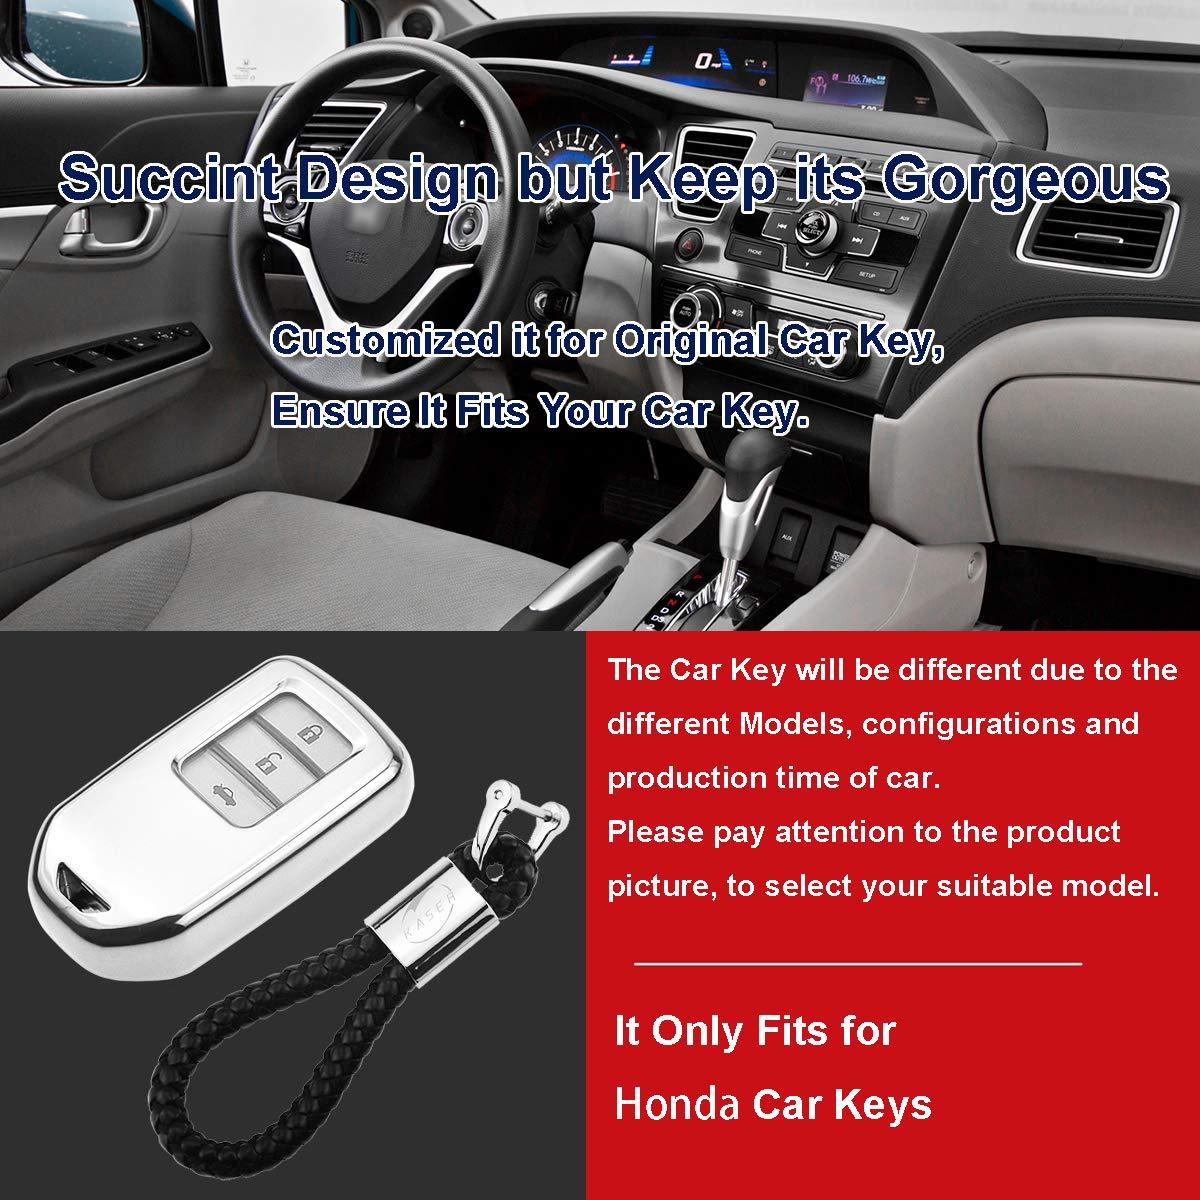 Kaser Soft TPU 3 4 5 Buttons Smart Car Remote Key Fob Cover Case Holder Shell Protector for Honda Accord Civic Jade Crider Odyseey CR-V Pilot Fit Greiz Elysion Vezel HR-V Spirior SLV